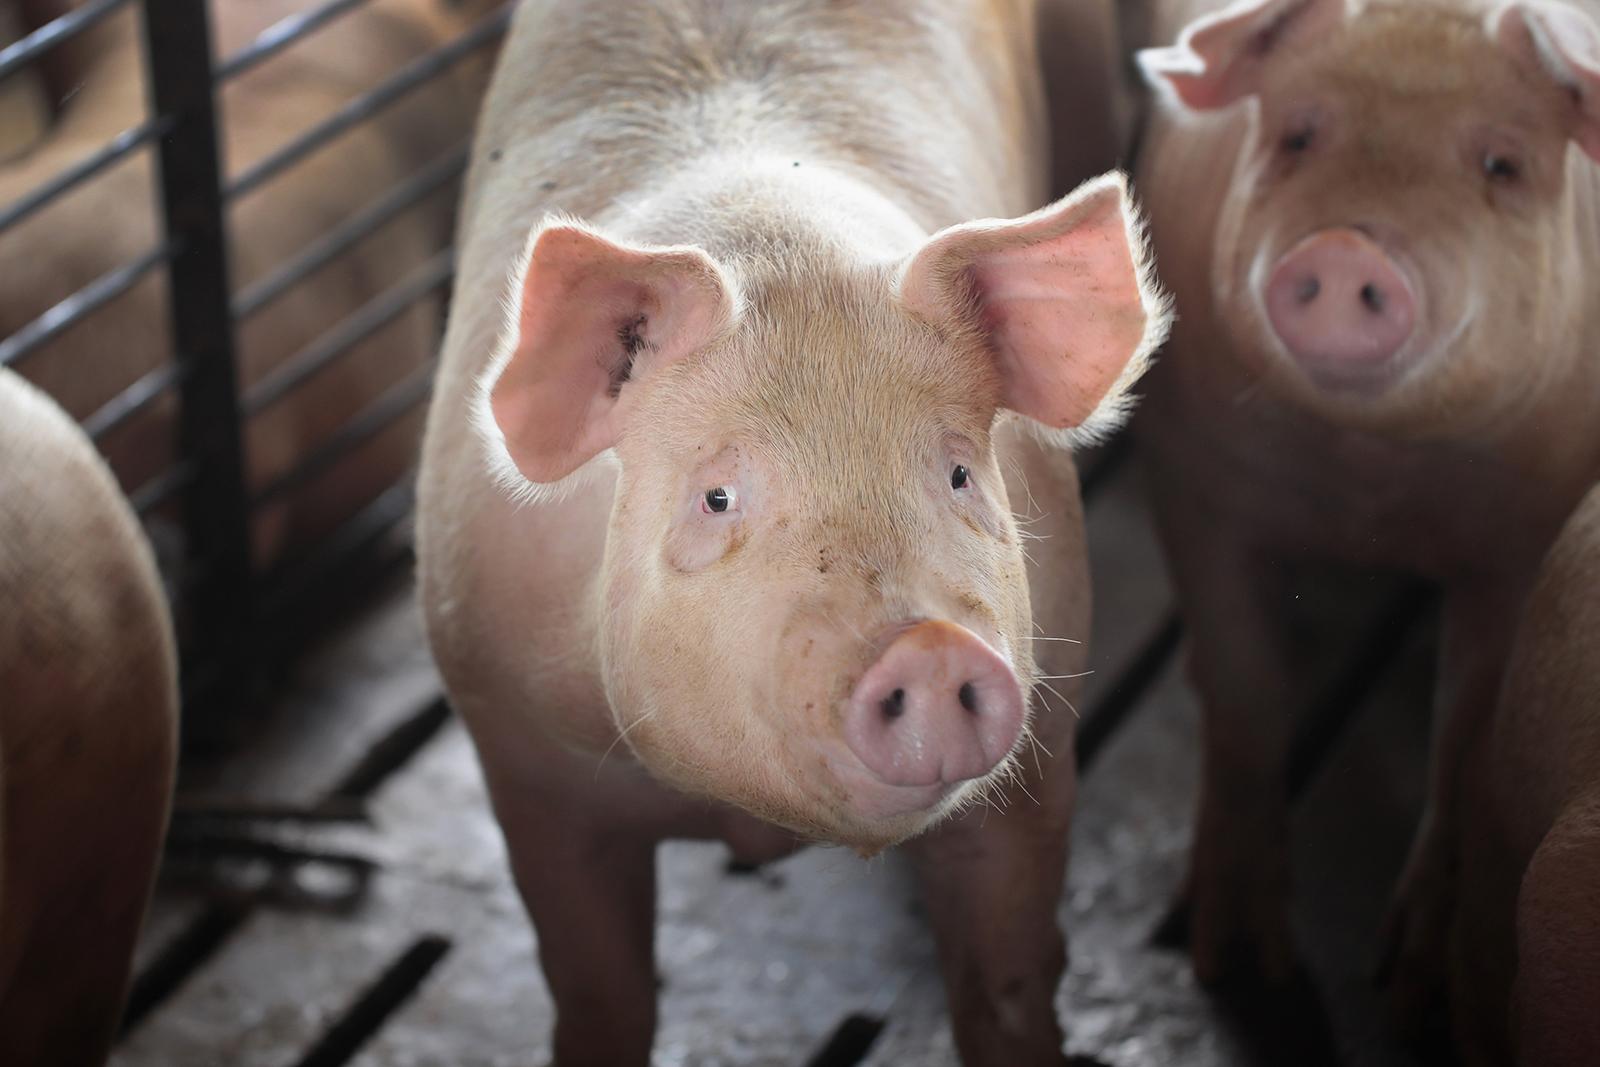 Hogs are raised on a farm near Osage, Iowa on July 25, 2018.